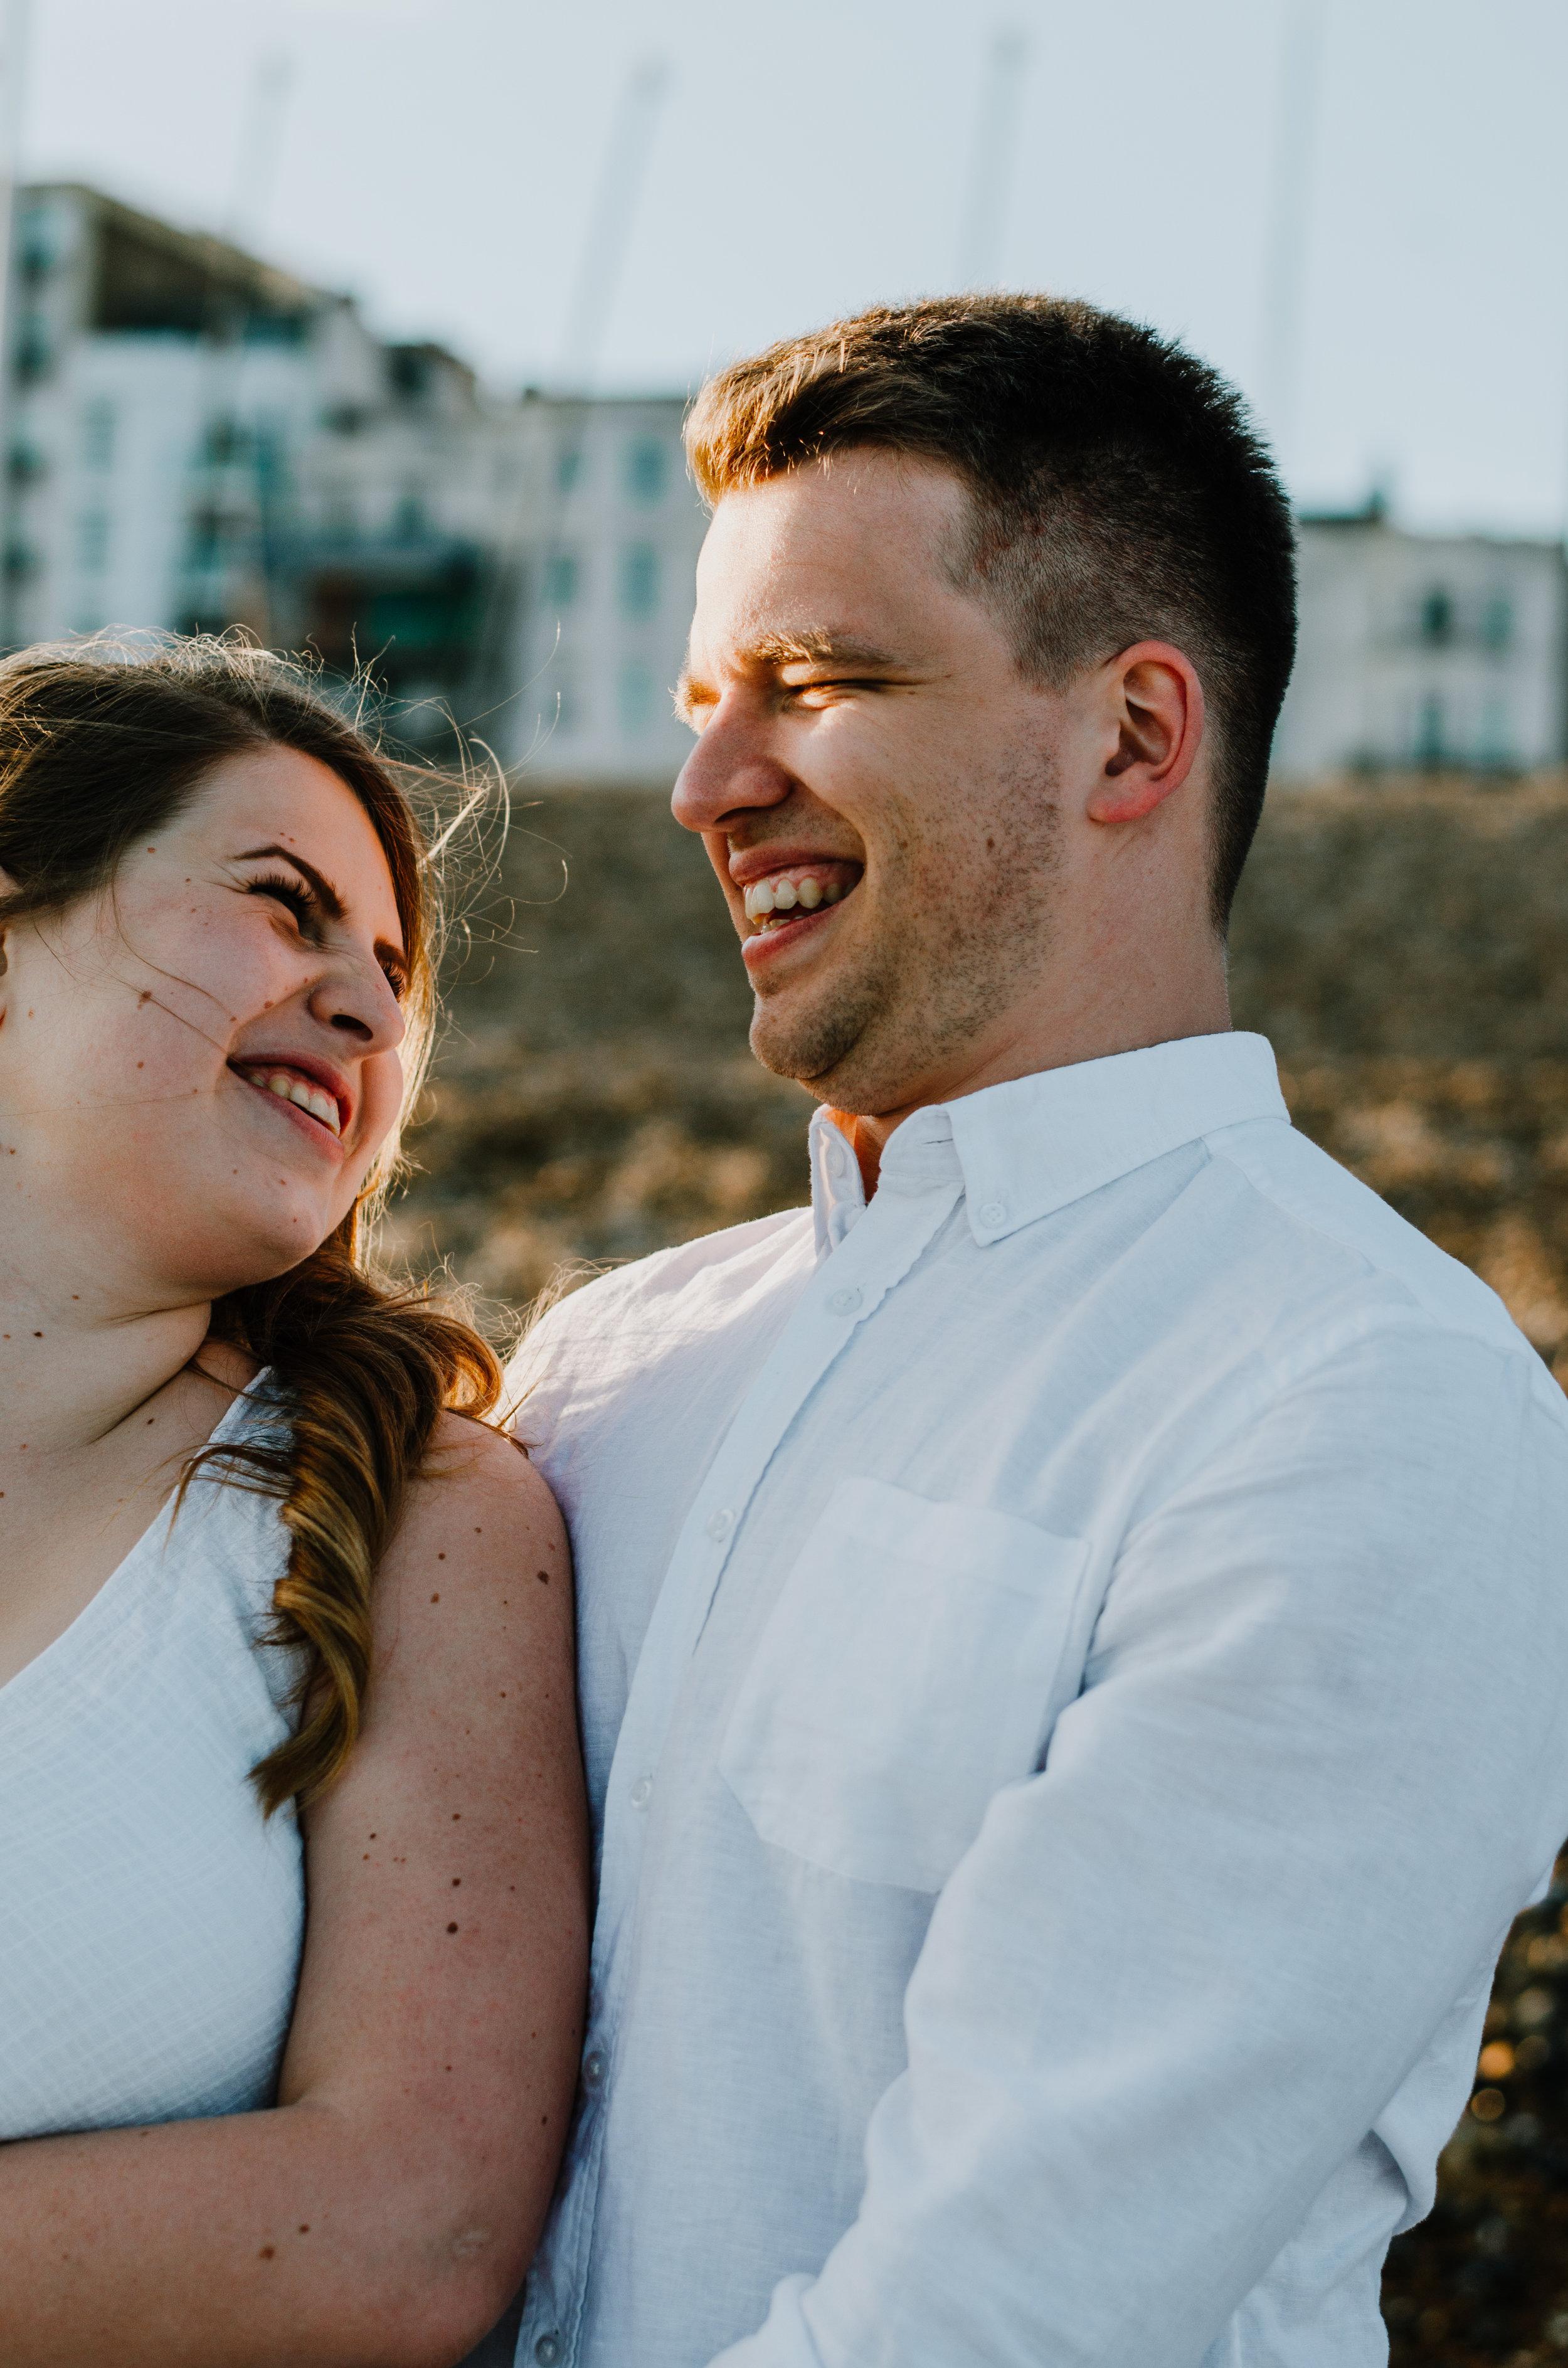 Ieva & Julius - Brighton Beach - Couple Session - Aiste Saulyte Photography-28.jpg